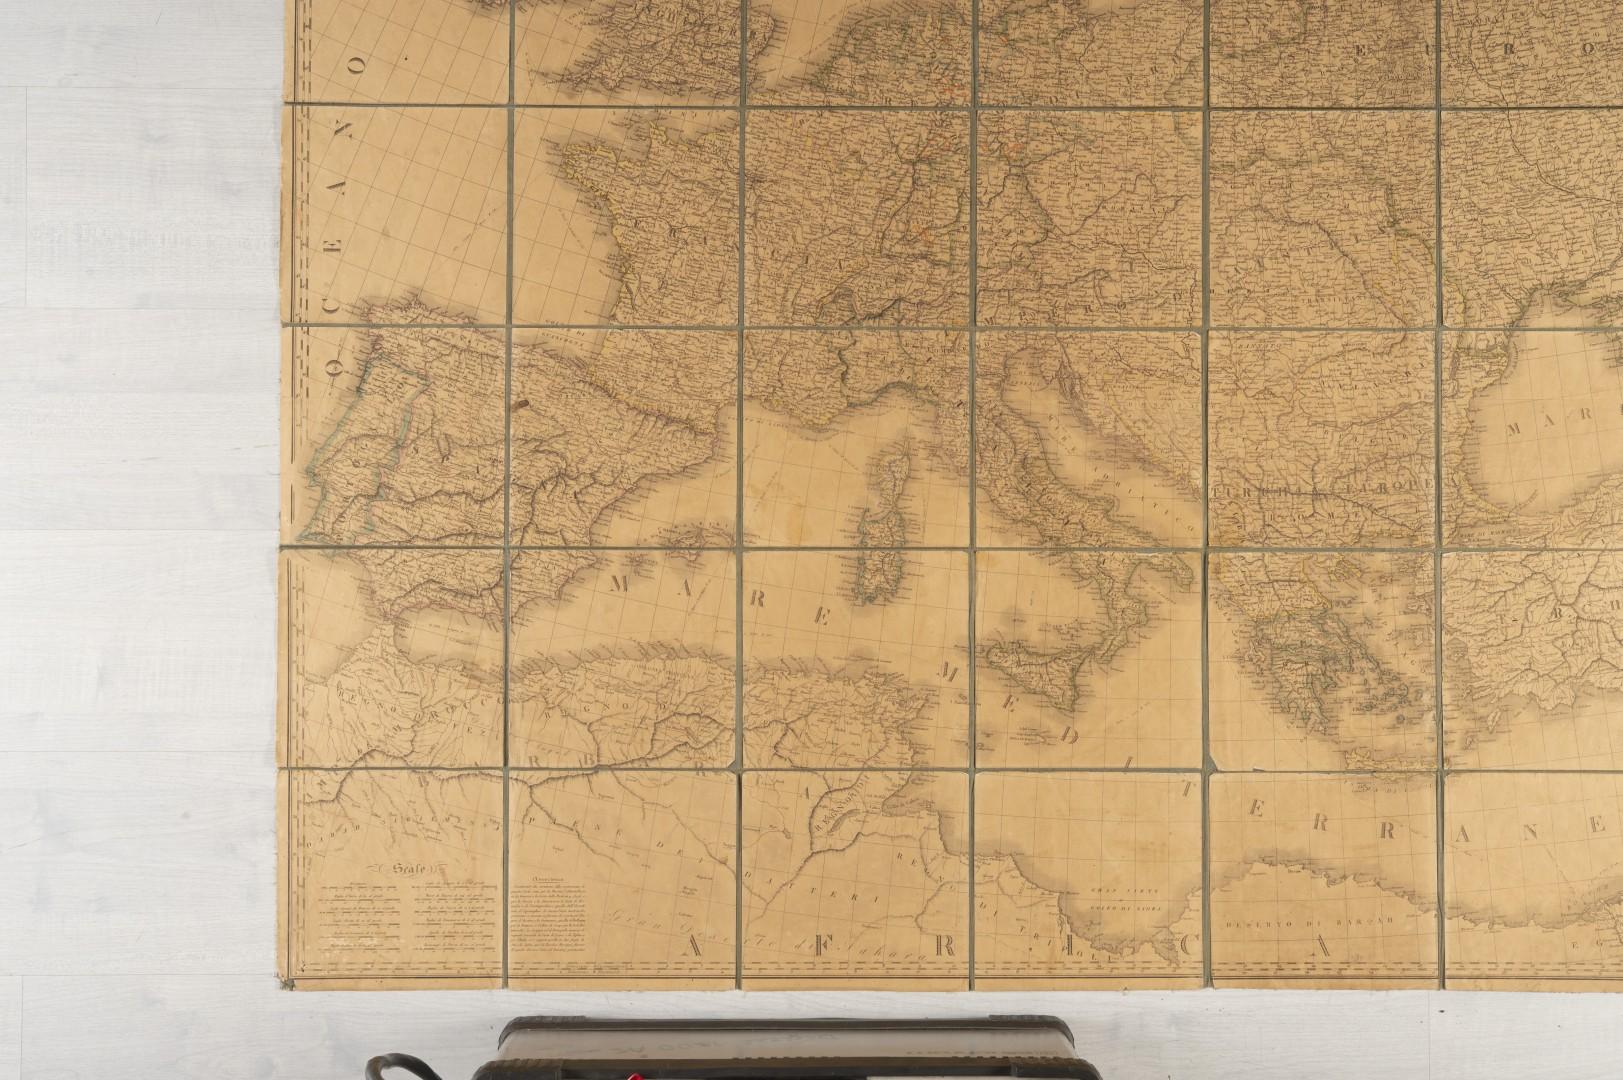 Stucchi, Stanislao Carta geografica statistica e stradale d'Europa. - Image 7 of 8